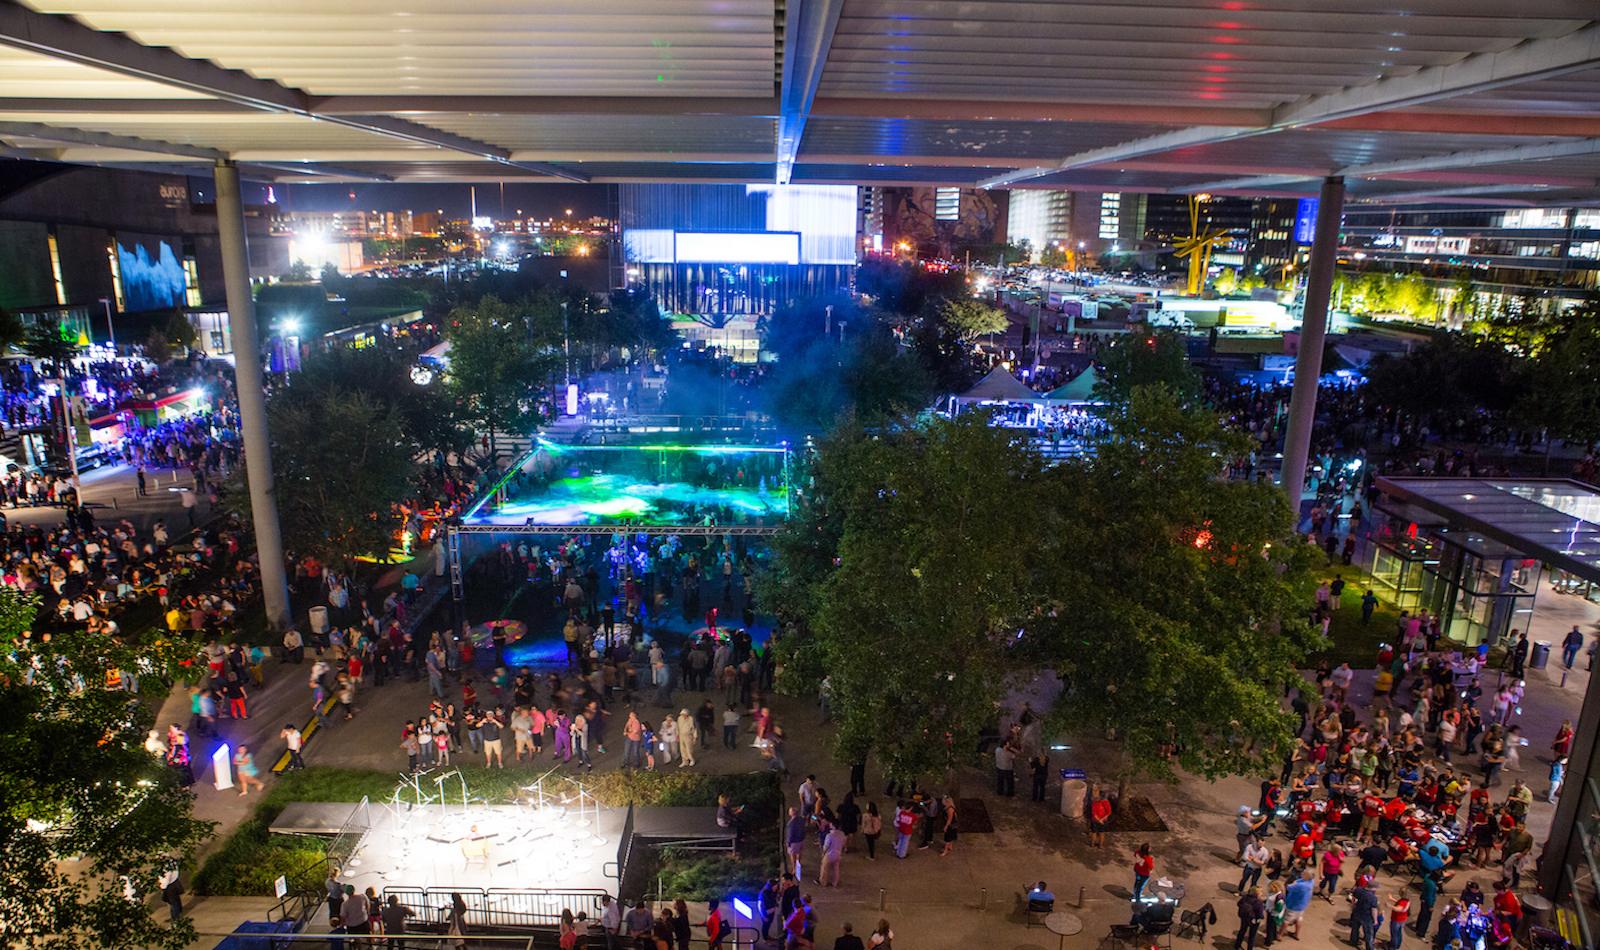 North Texas' Arts & Culture Industry Generates $1.4B in Economic Activity